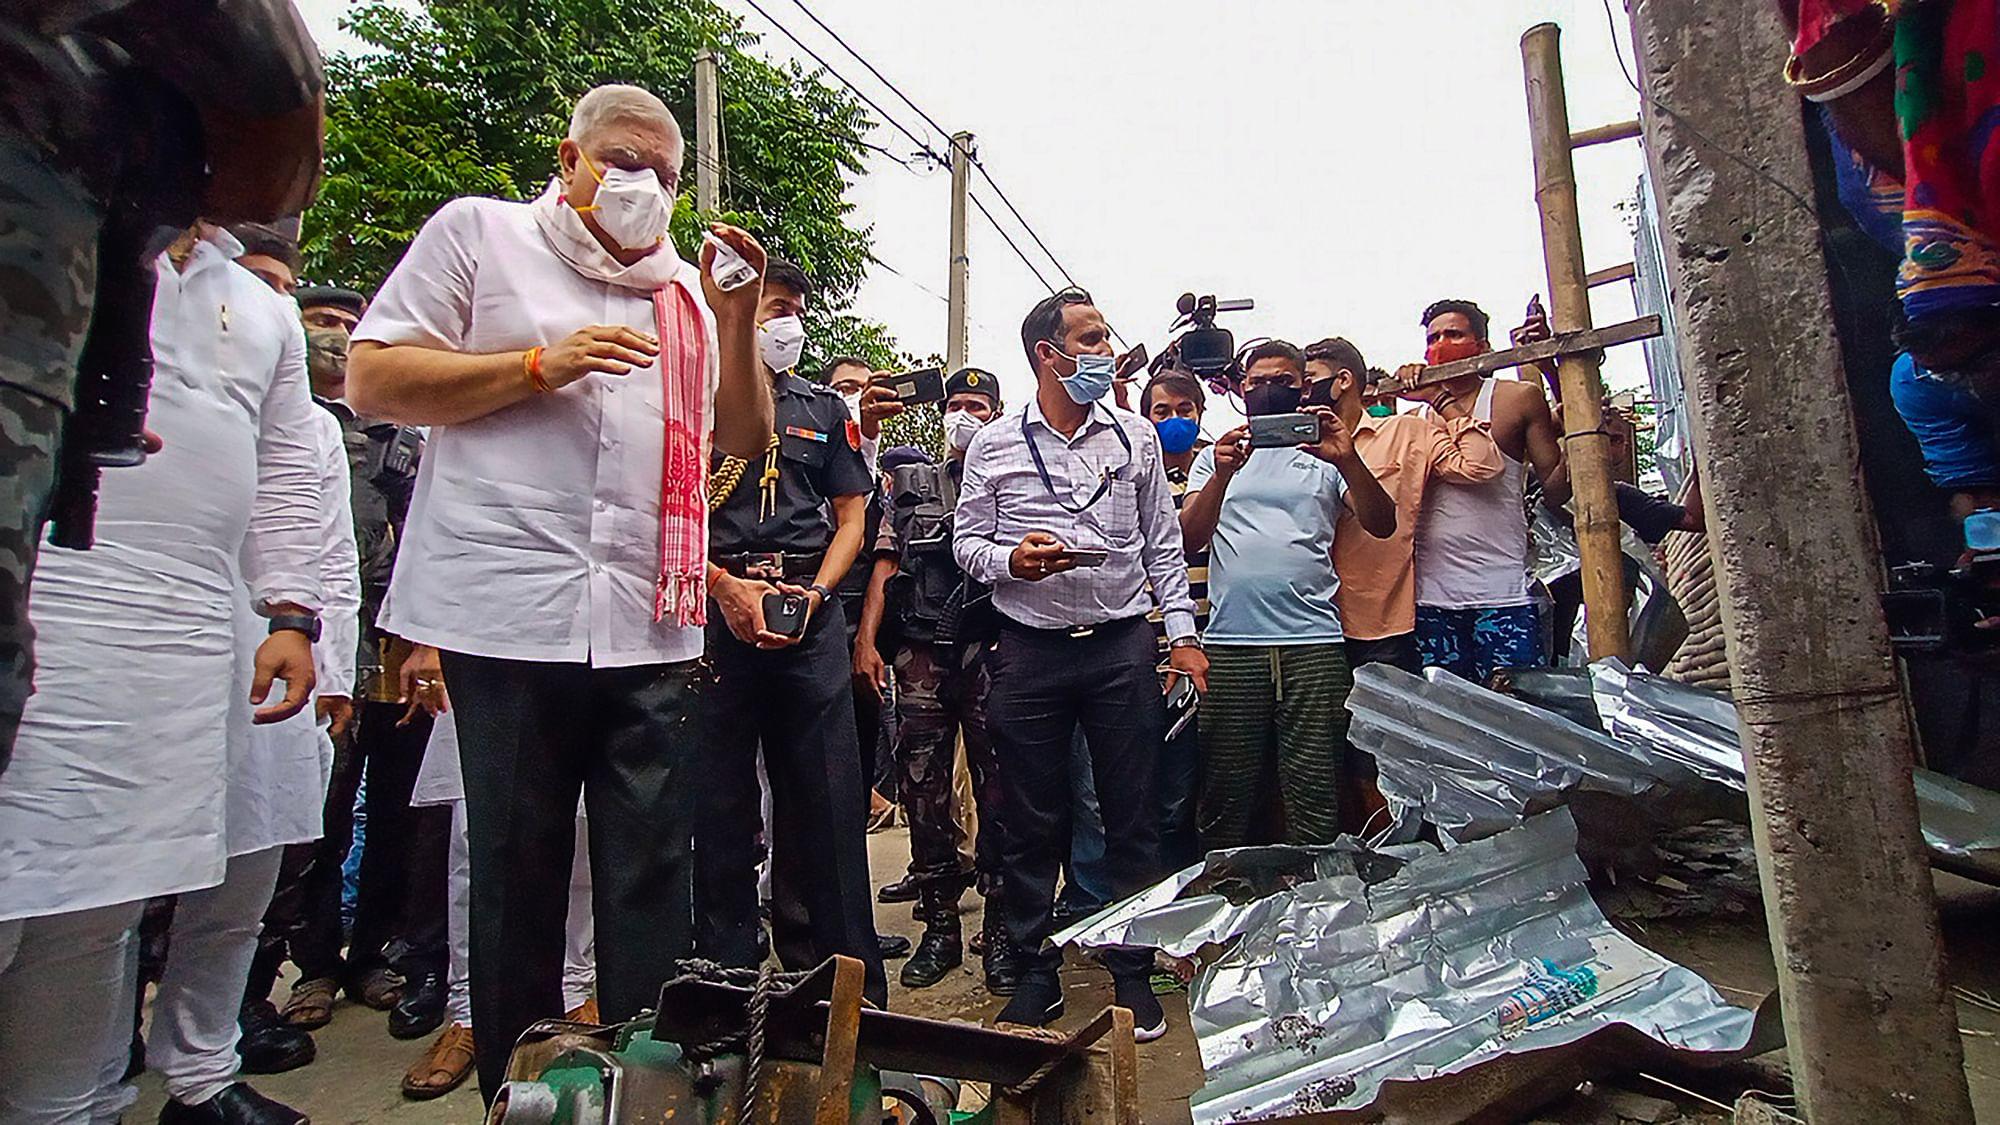 West Bengal   बंगाल: हिंसा प्रभावित इलाकों में पहुंचे राज्यपाल, जमकर हुआ विरोध   West Bengal Governor Jagdeep Dhankhar Visited Cooch Behar